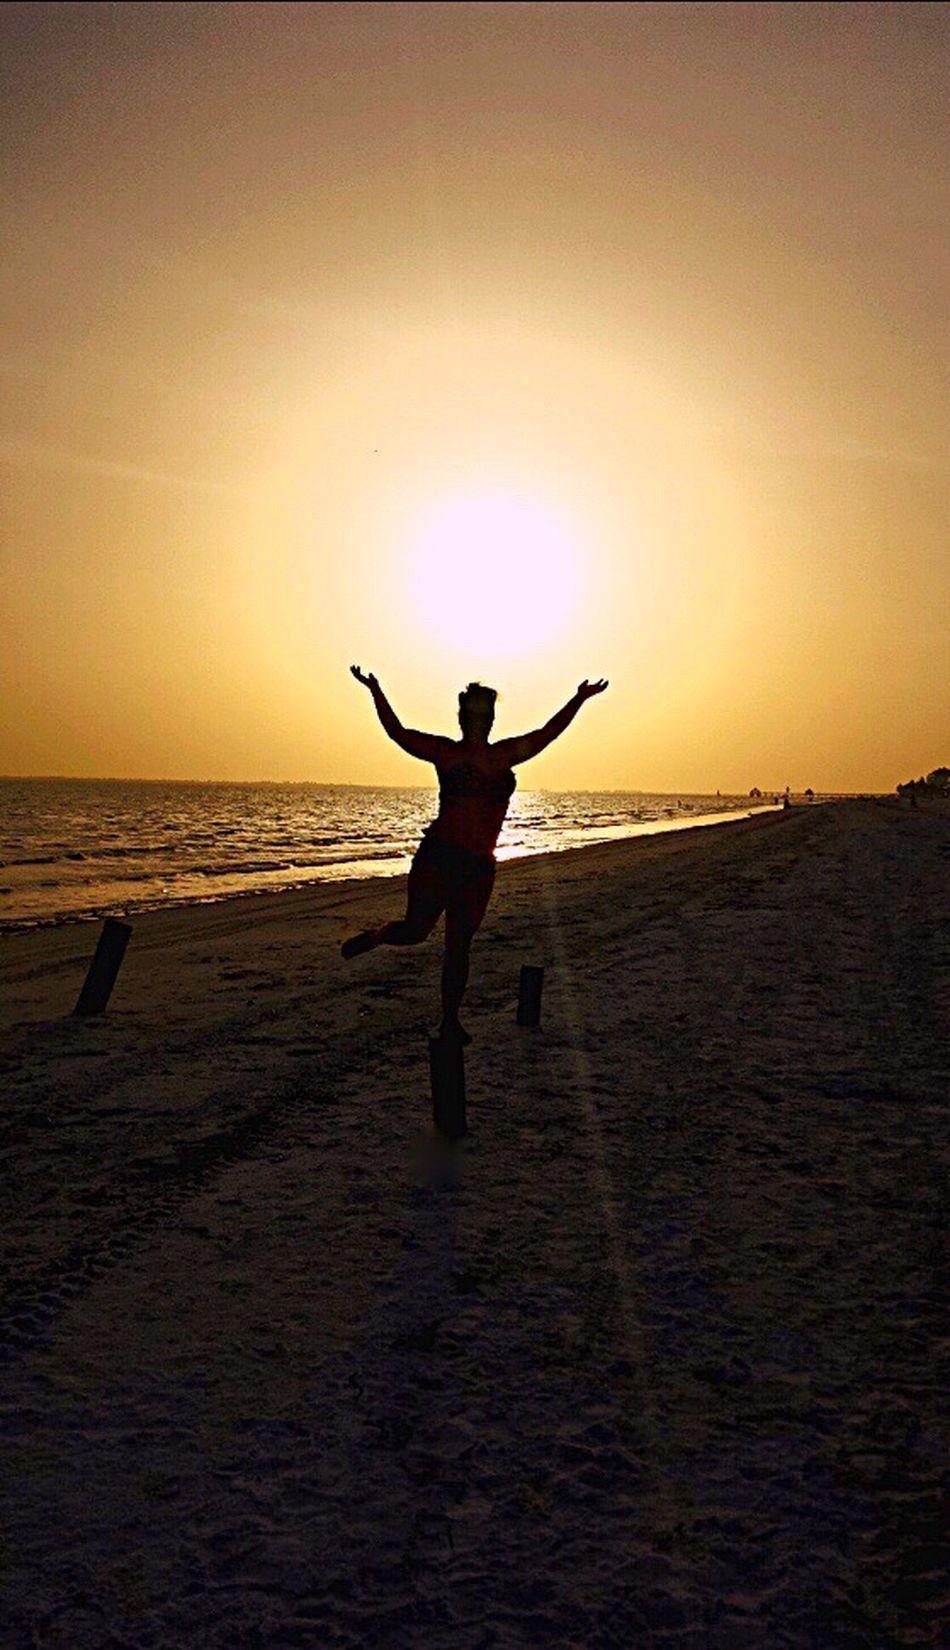 People And Places Sunset Beach Silhouette Arms Outstretched Tranquil Scene Arms Raised EyeemPhotos This Week On Eyeem EyeEm Best Shots EyeEm Fresh On Eyeem  Check This Out EyeEm Gallery EyeEmBestPics EyeemShot Eyeemphotography EyeEm Nature Lover EyeEmPortraits EyeEm Masterclass EyeEm Best Shots - Nature